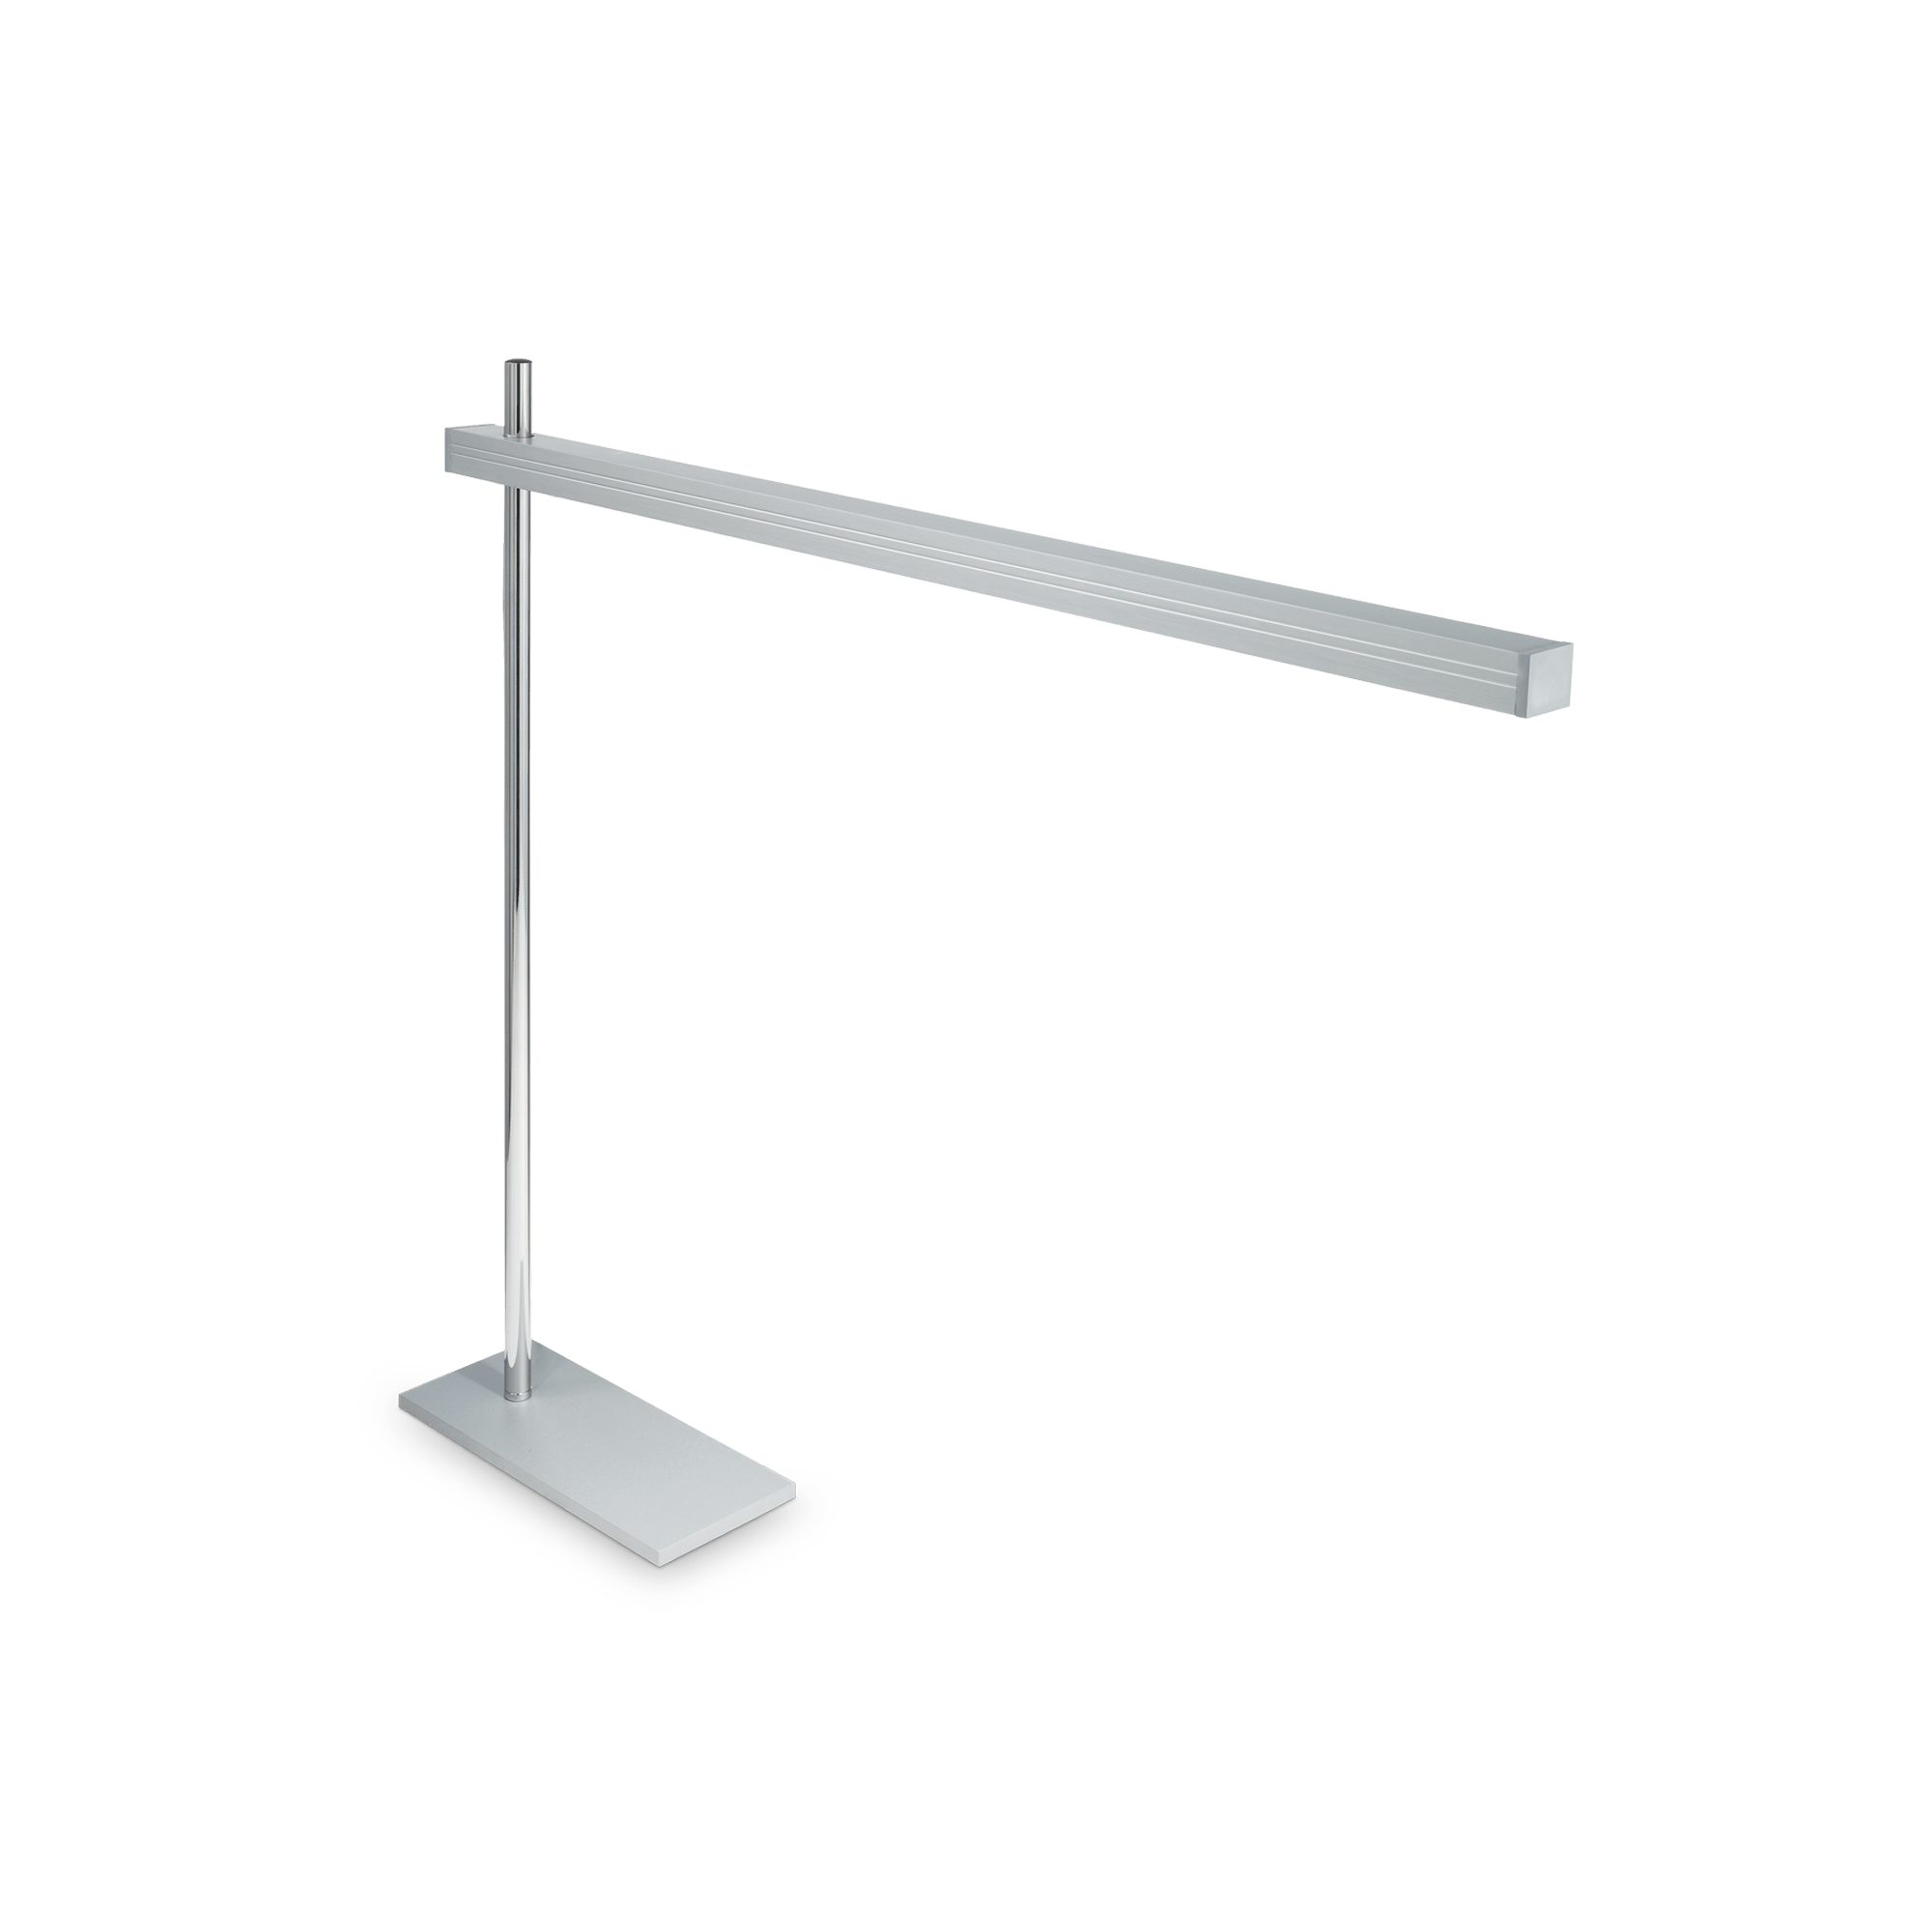 Ideal Lux 147635 GRU TL105 ALUMINIO asztali lámpa